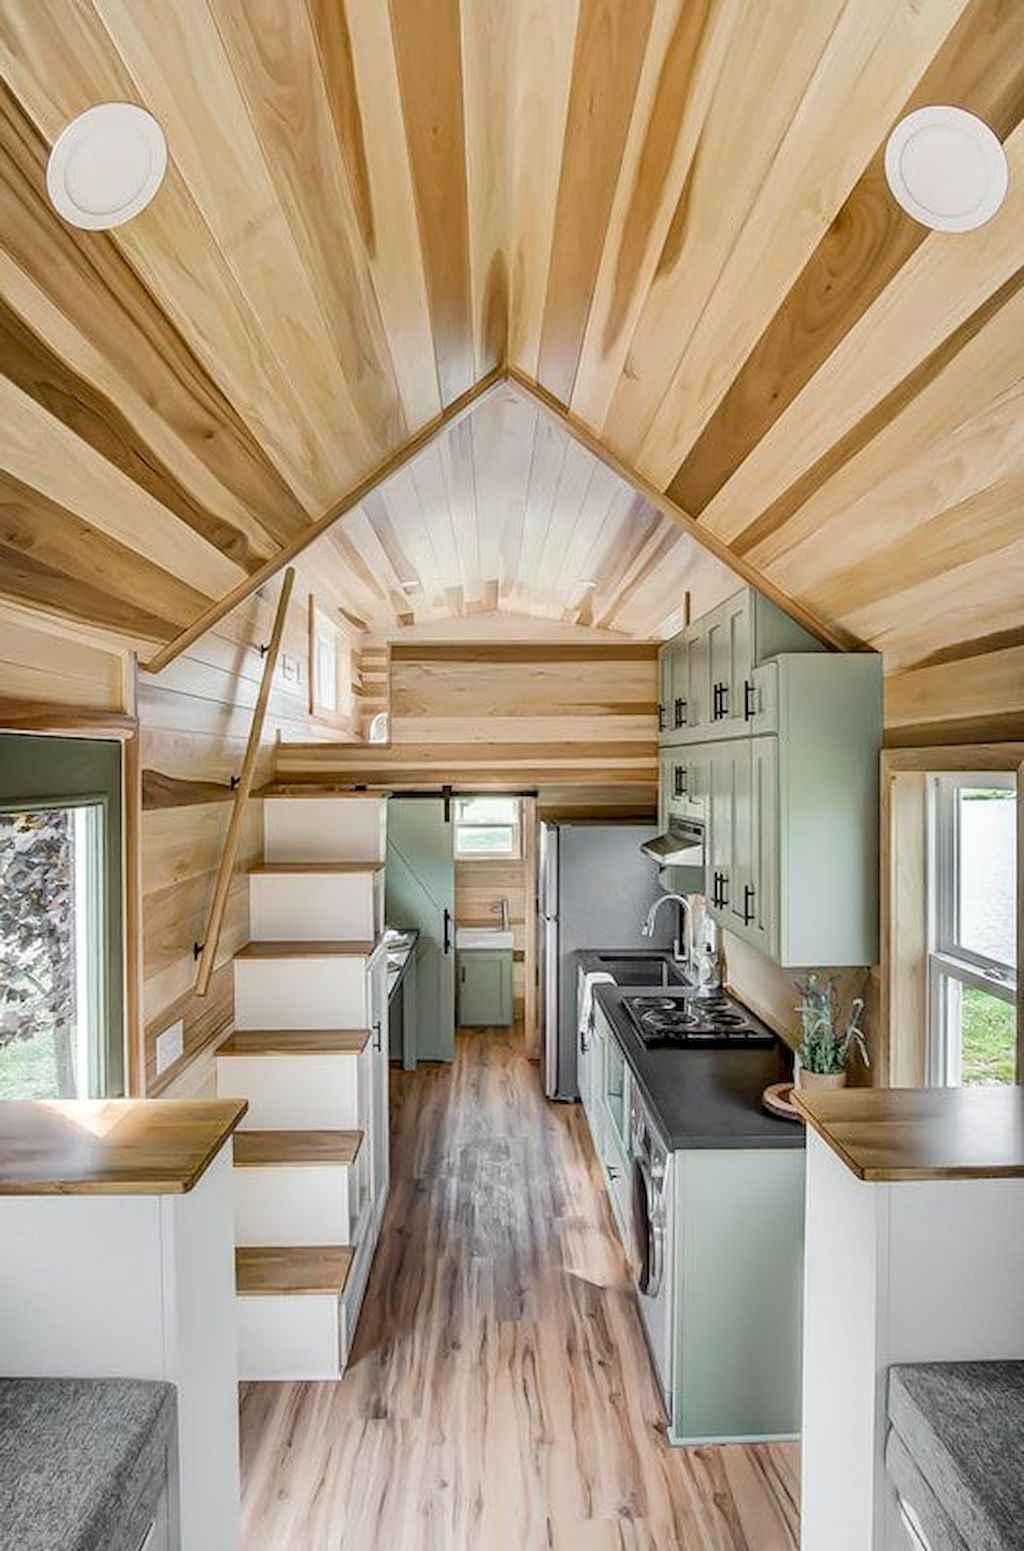 32 Tiny House Kitchen Storage Organization and Tips Ideas